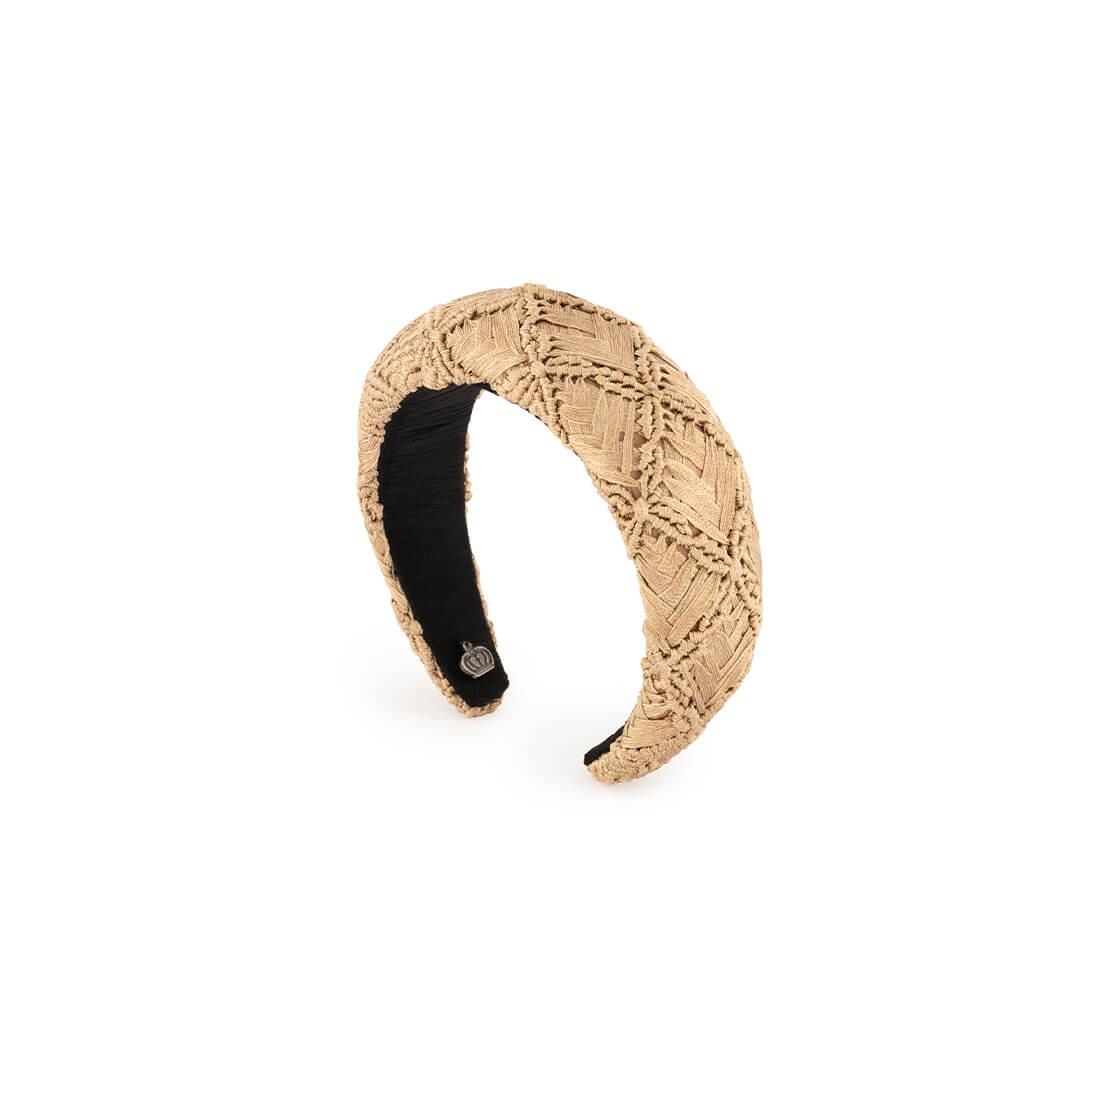 Handwoven, macramé headband 1